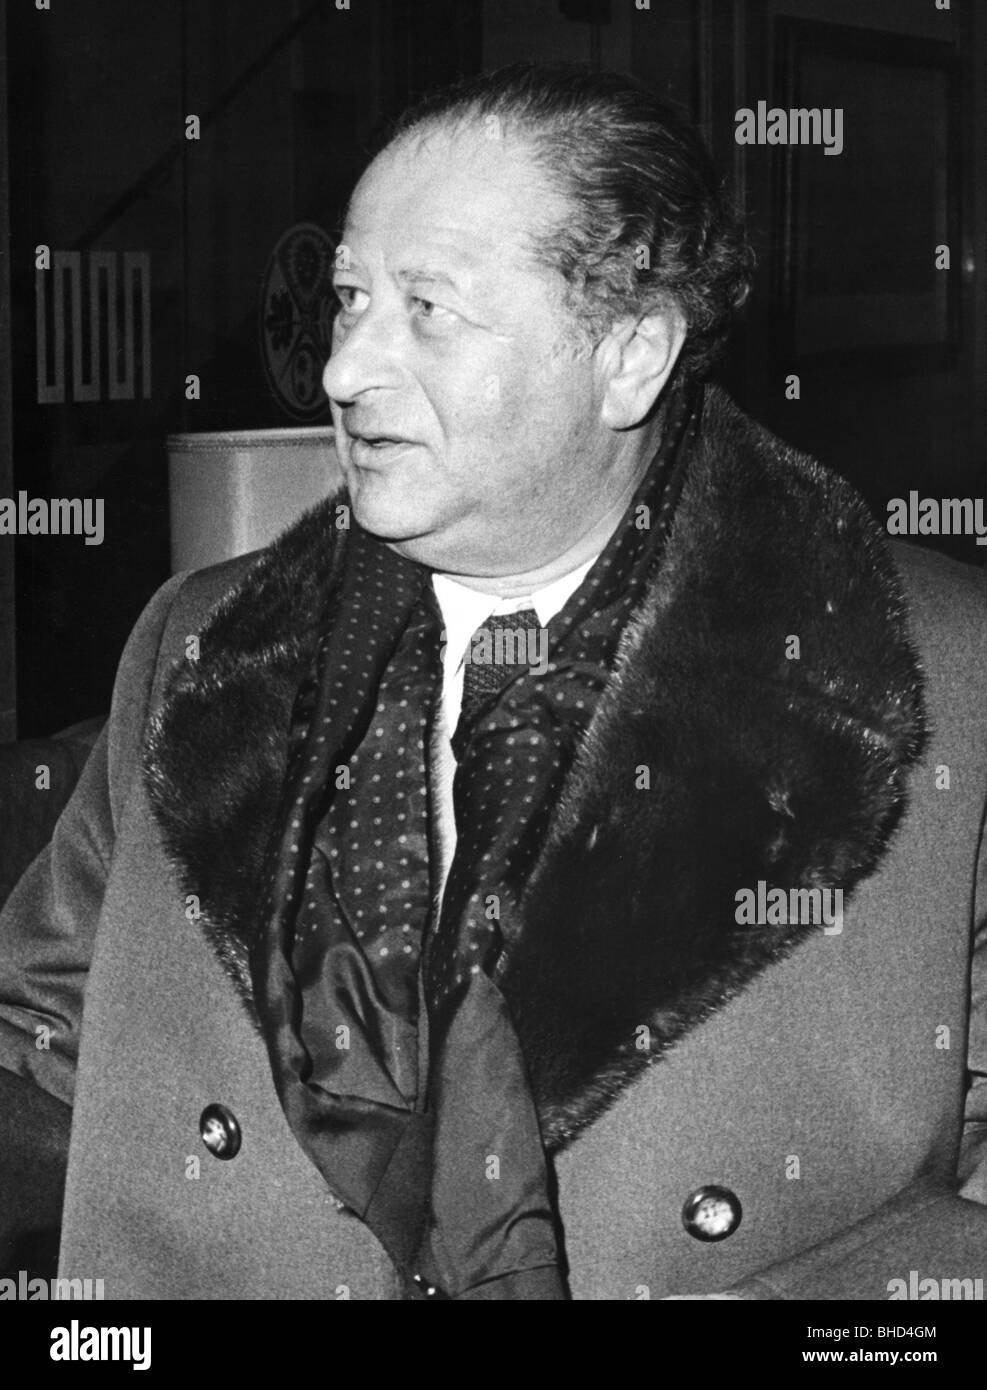 Kreisky, Bruno, 22.1.1911 - 29 7.1990, Austrian politician (Social Democrat), Chancellor of Austria 1970 - 1983, - Stock Image